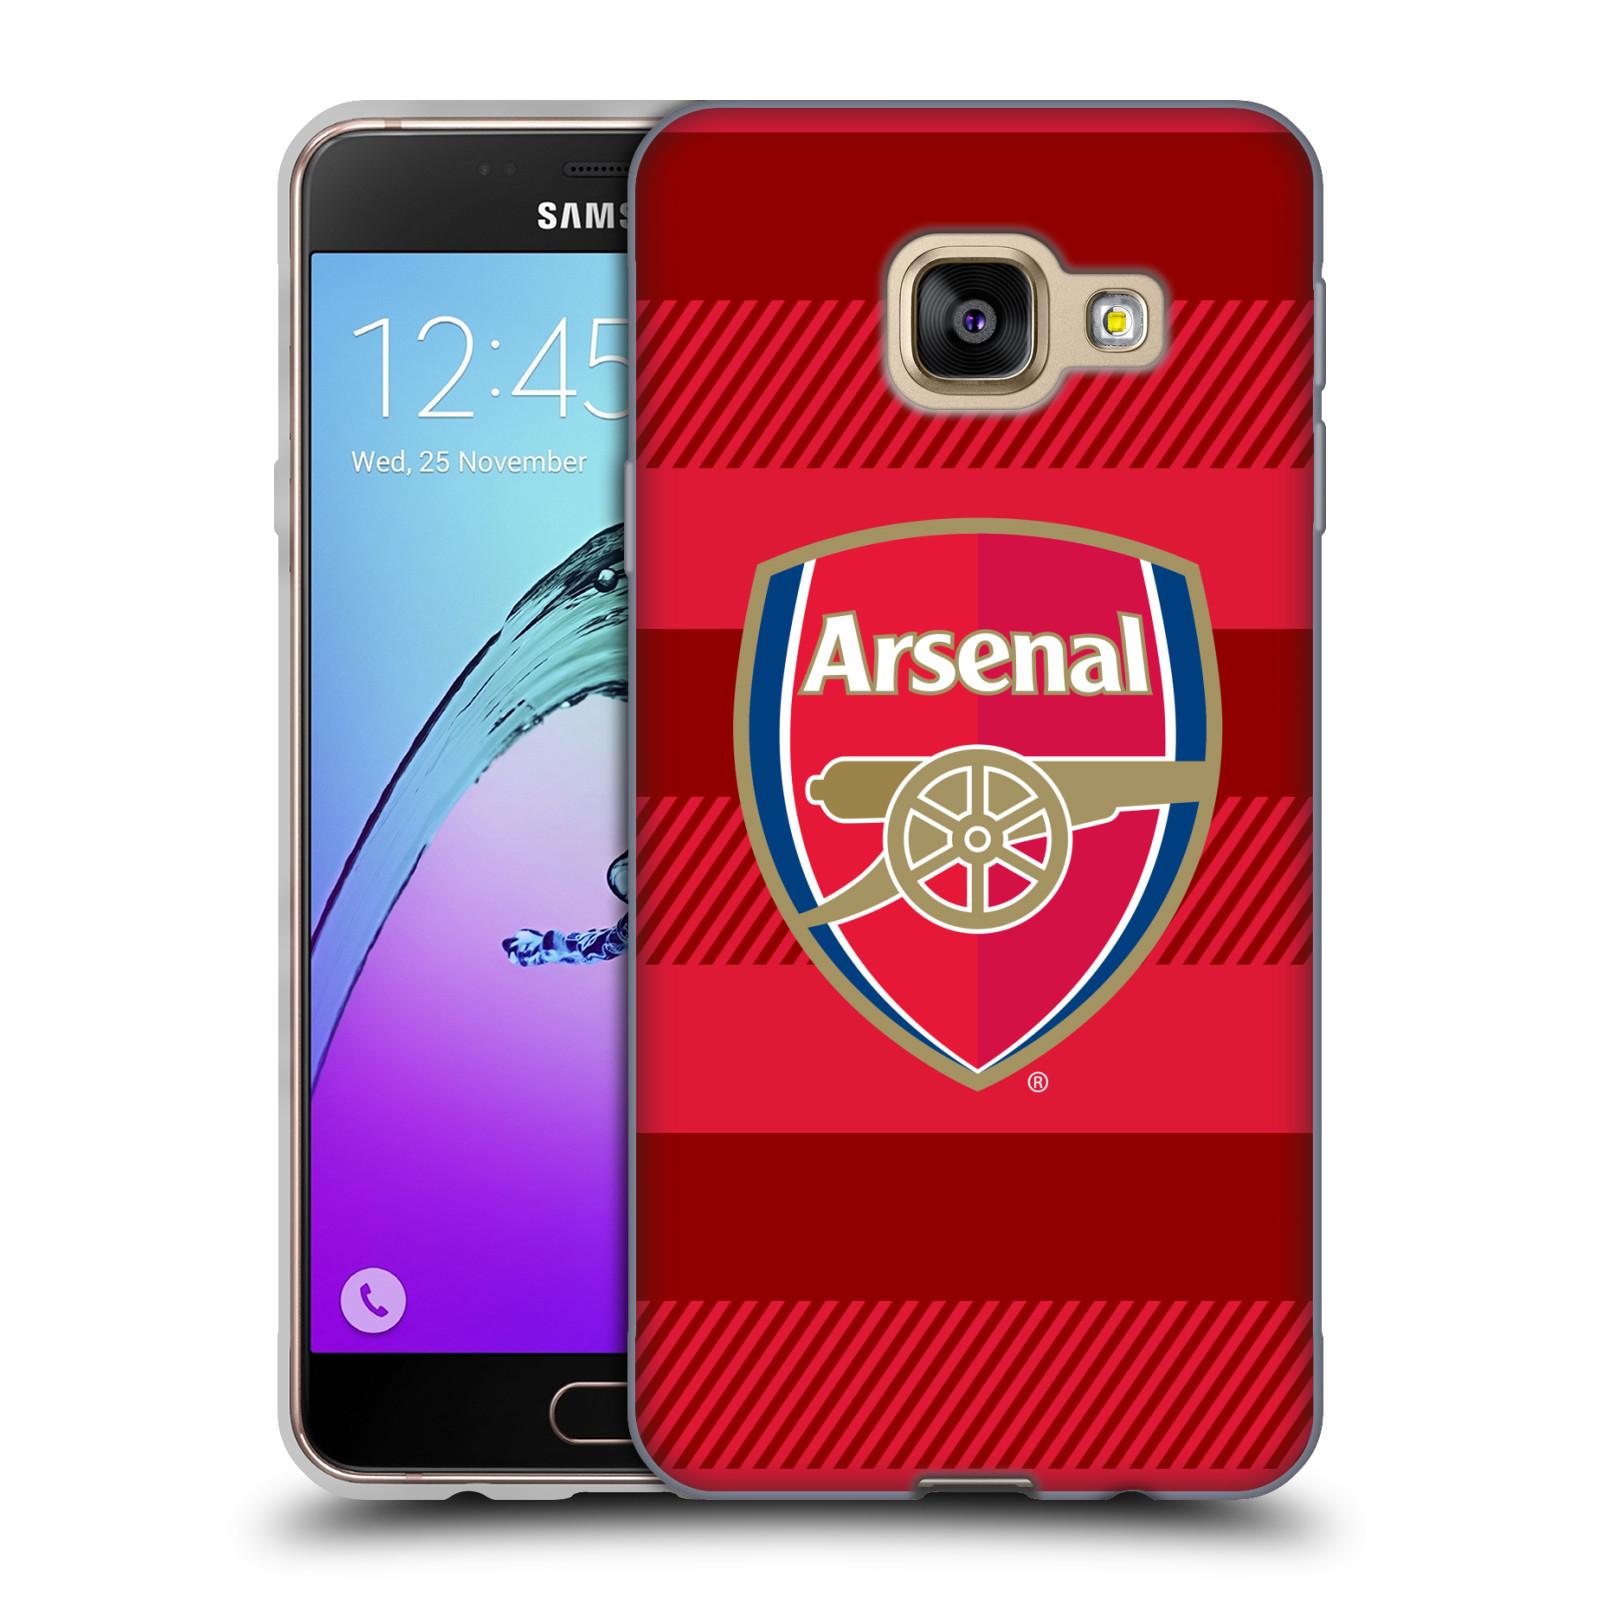 Silikonové pouzdro na mobil Samsung Galaxy A3 (2016) - Head Case - Arsenal FC - Logo s pruhy